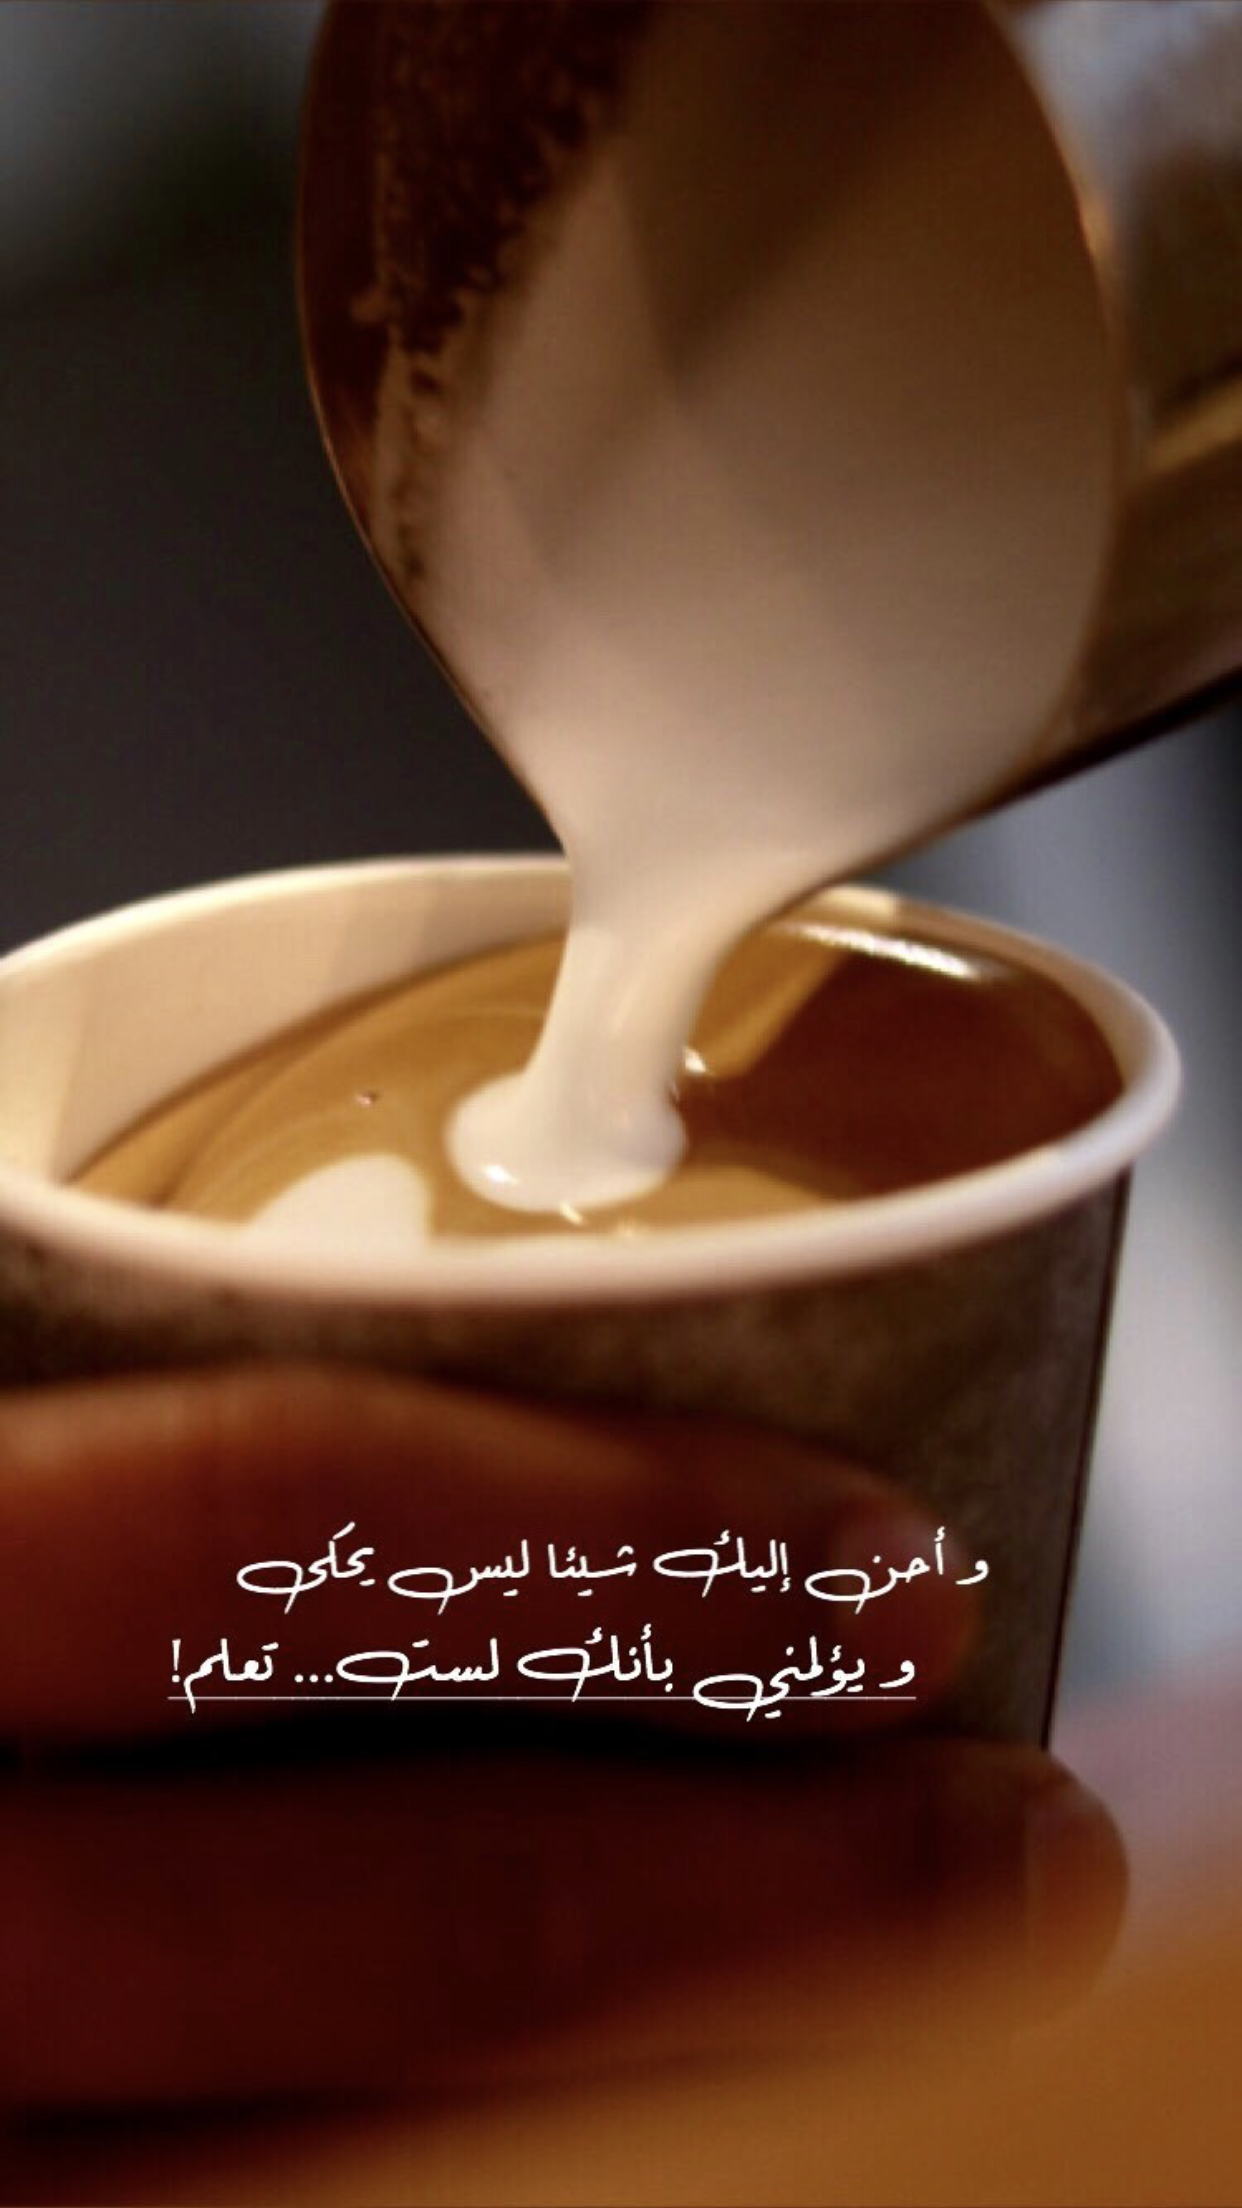 مختارات موضي البليهد image by موضي البليهد My coffee